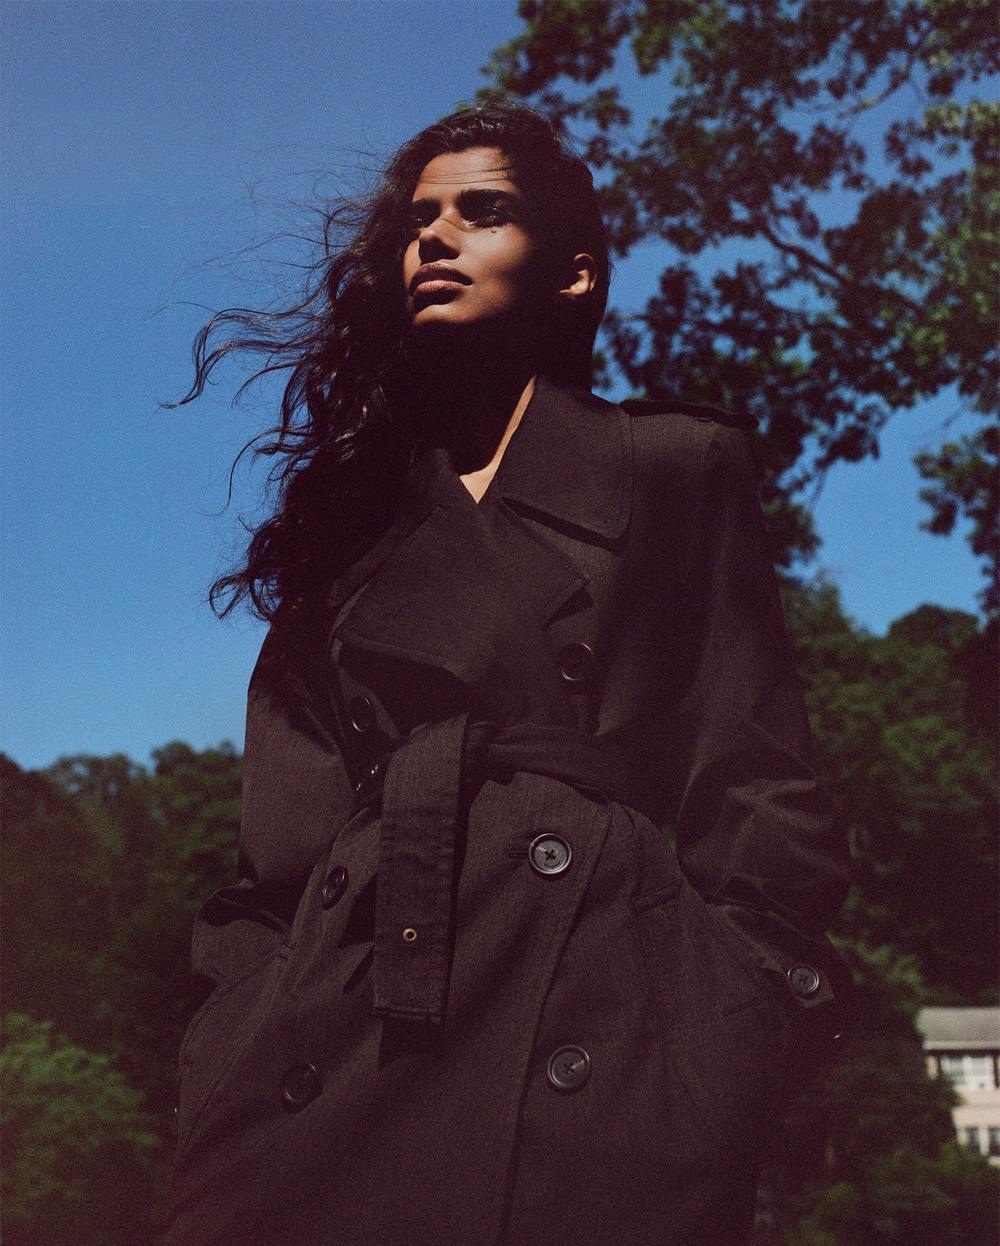 Vogue-Russia-Pooja-Mor-Buzz-White-9.jpg